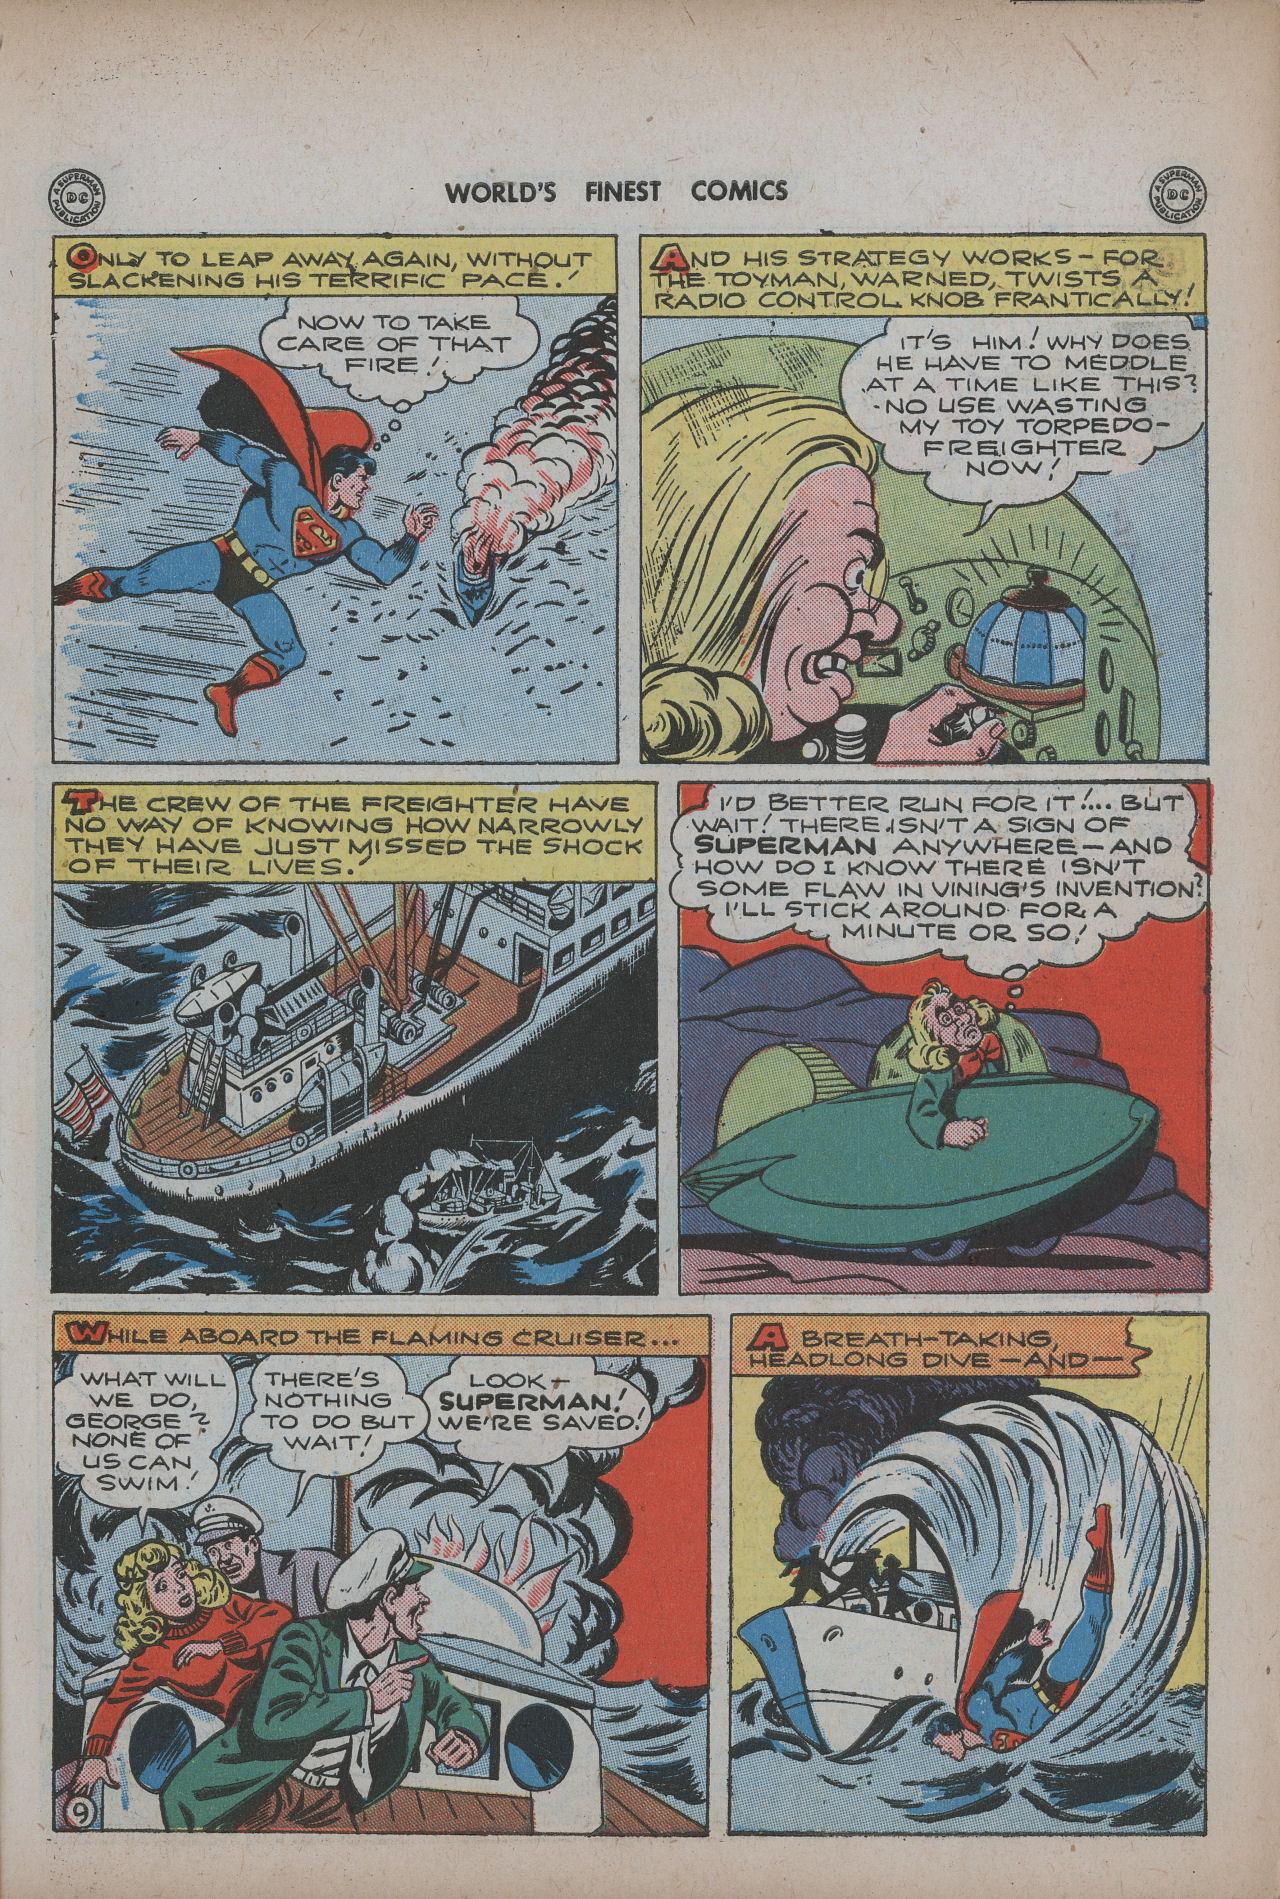 Read online World's Finest Comics comic -  Issue #20 - 11